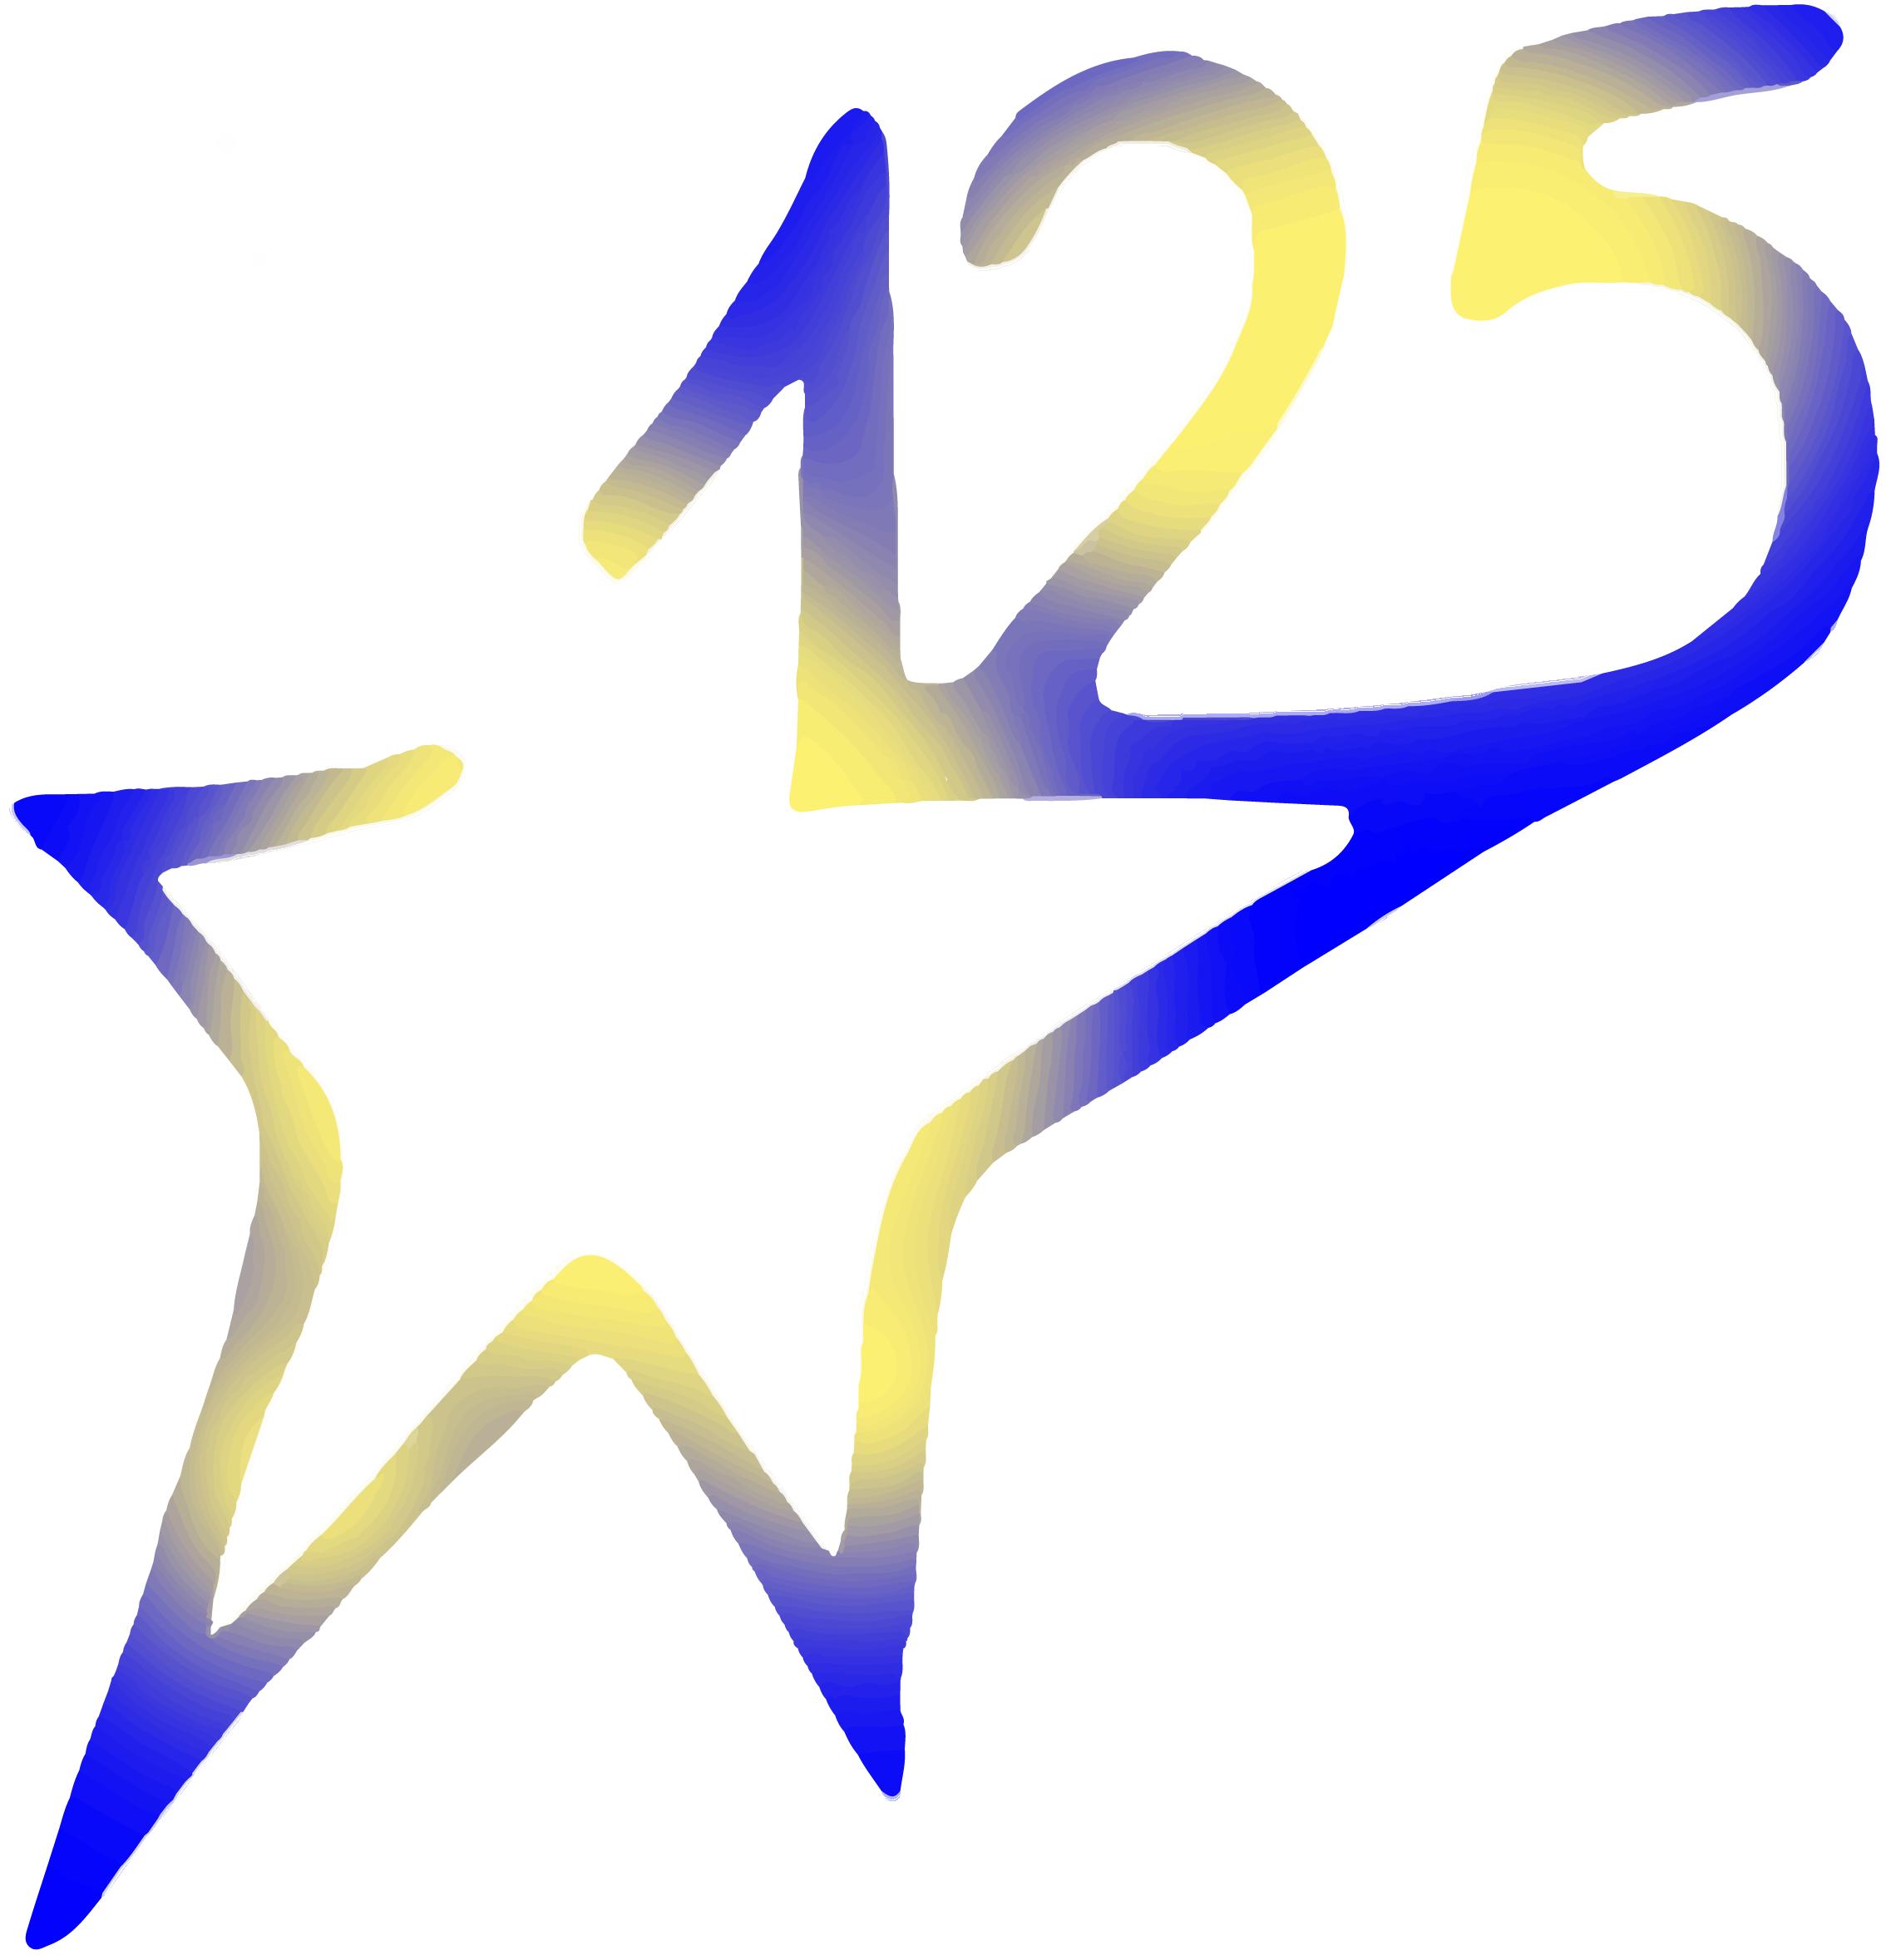 #125lasallebenicarlo